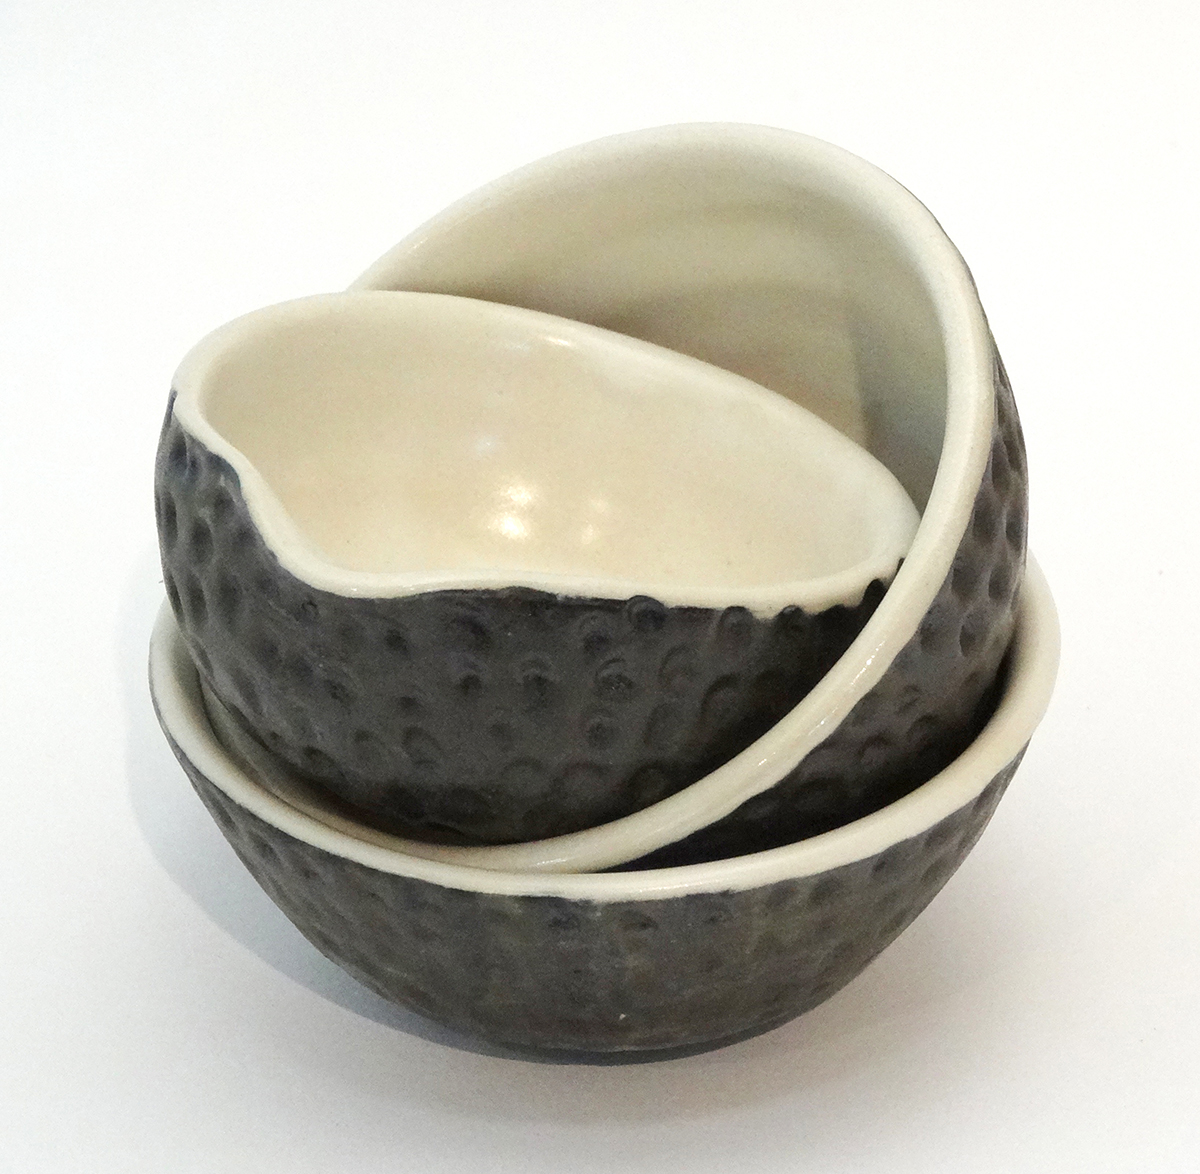 Three small condiment bowls